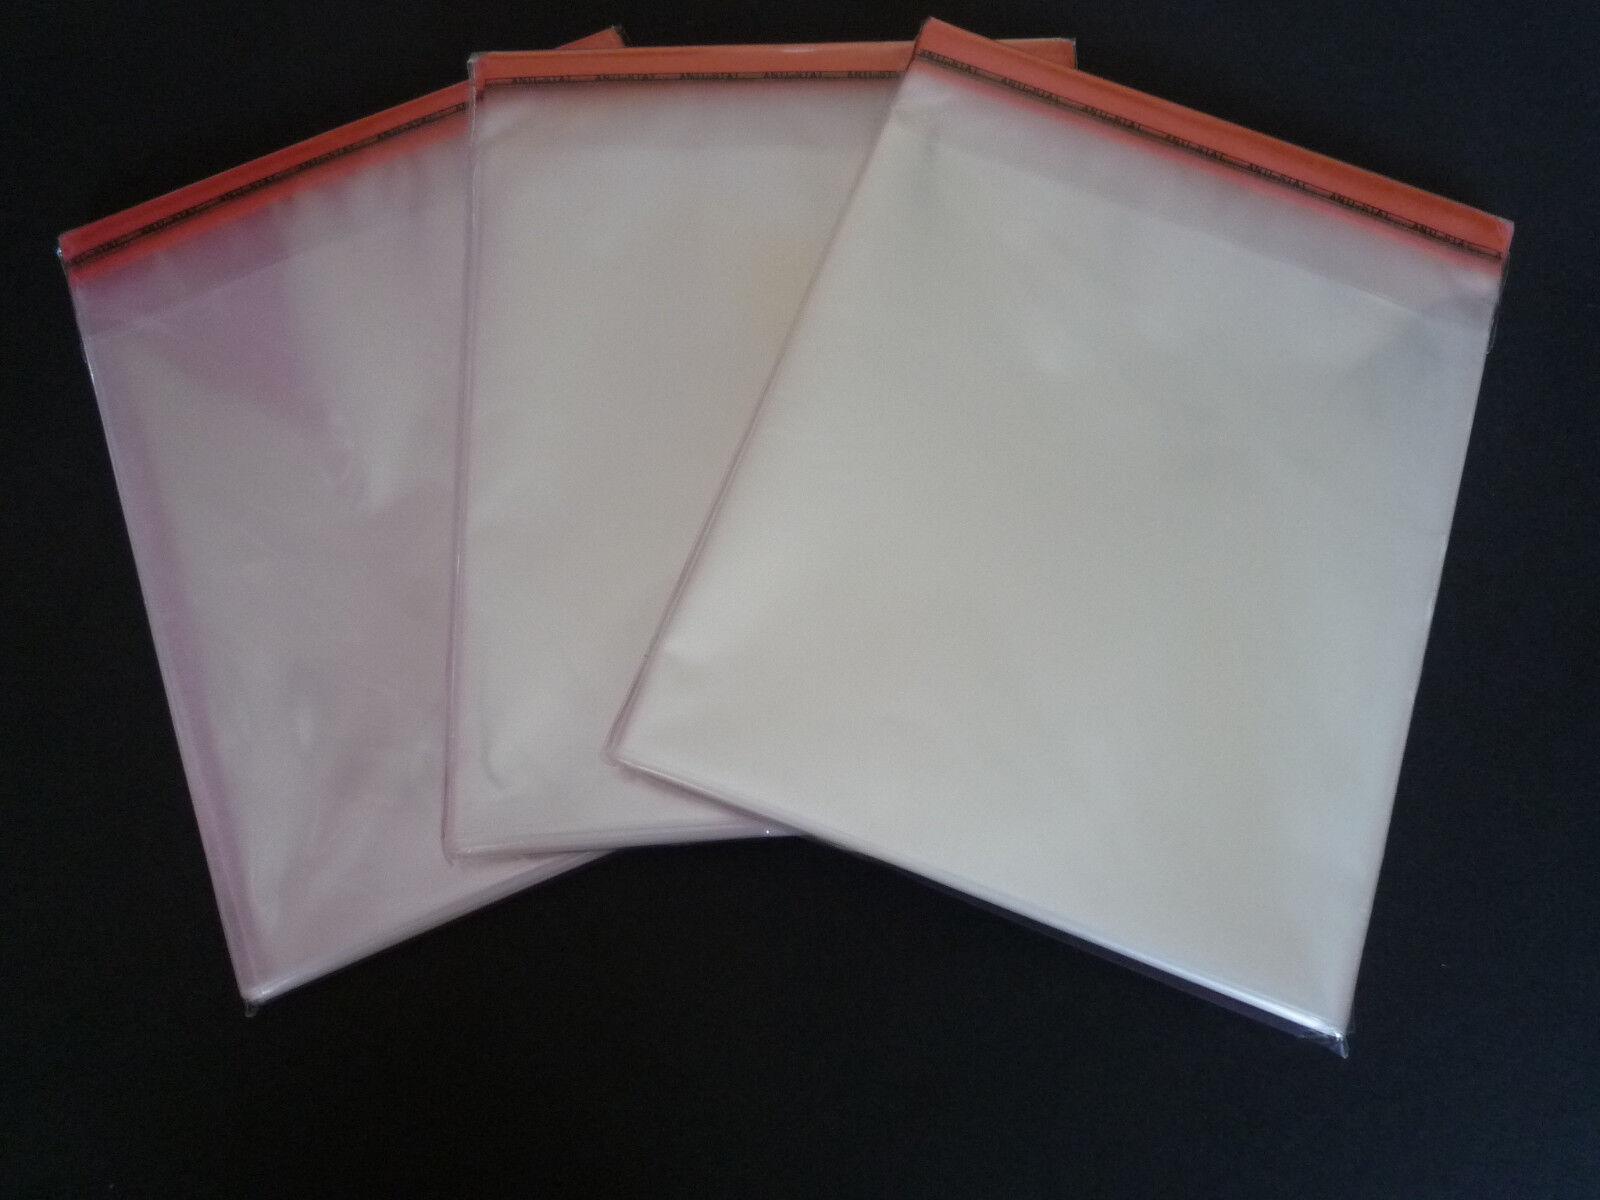 1000 Schutzhüllen 16,5x22,53cm Kartenhüllen Klarsichthüllen DIN A5 C5, glasklar   | Das hochwertigste Material  | Verkauf